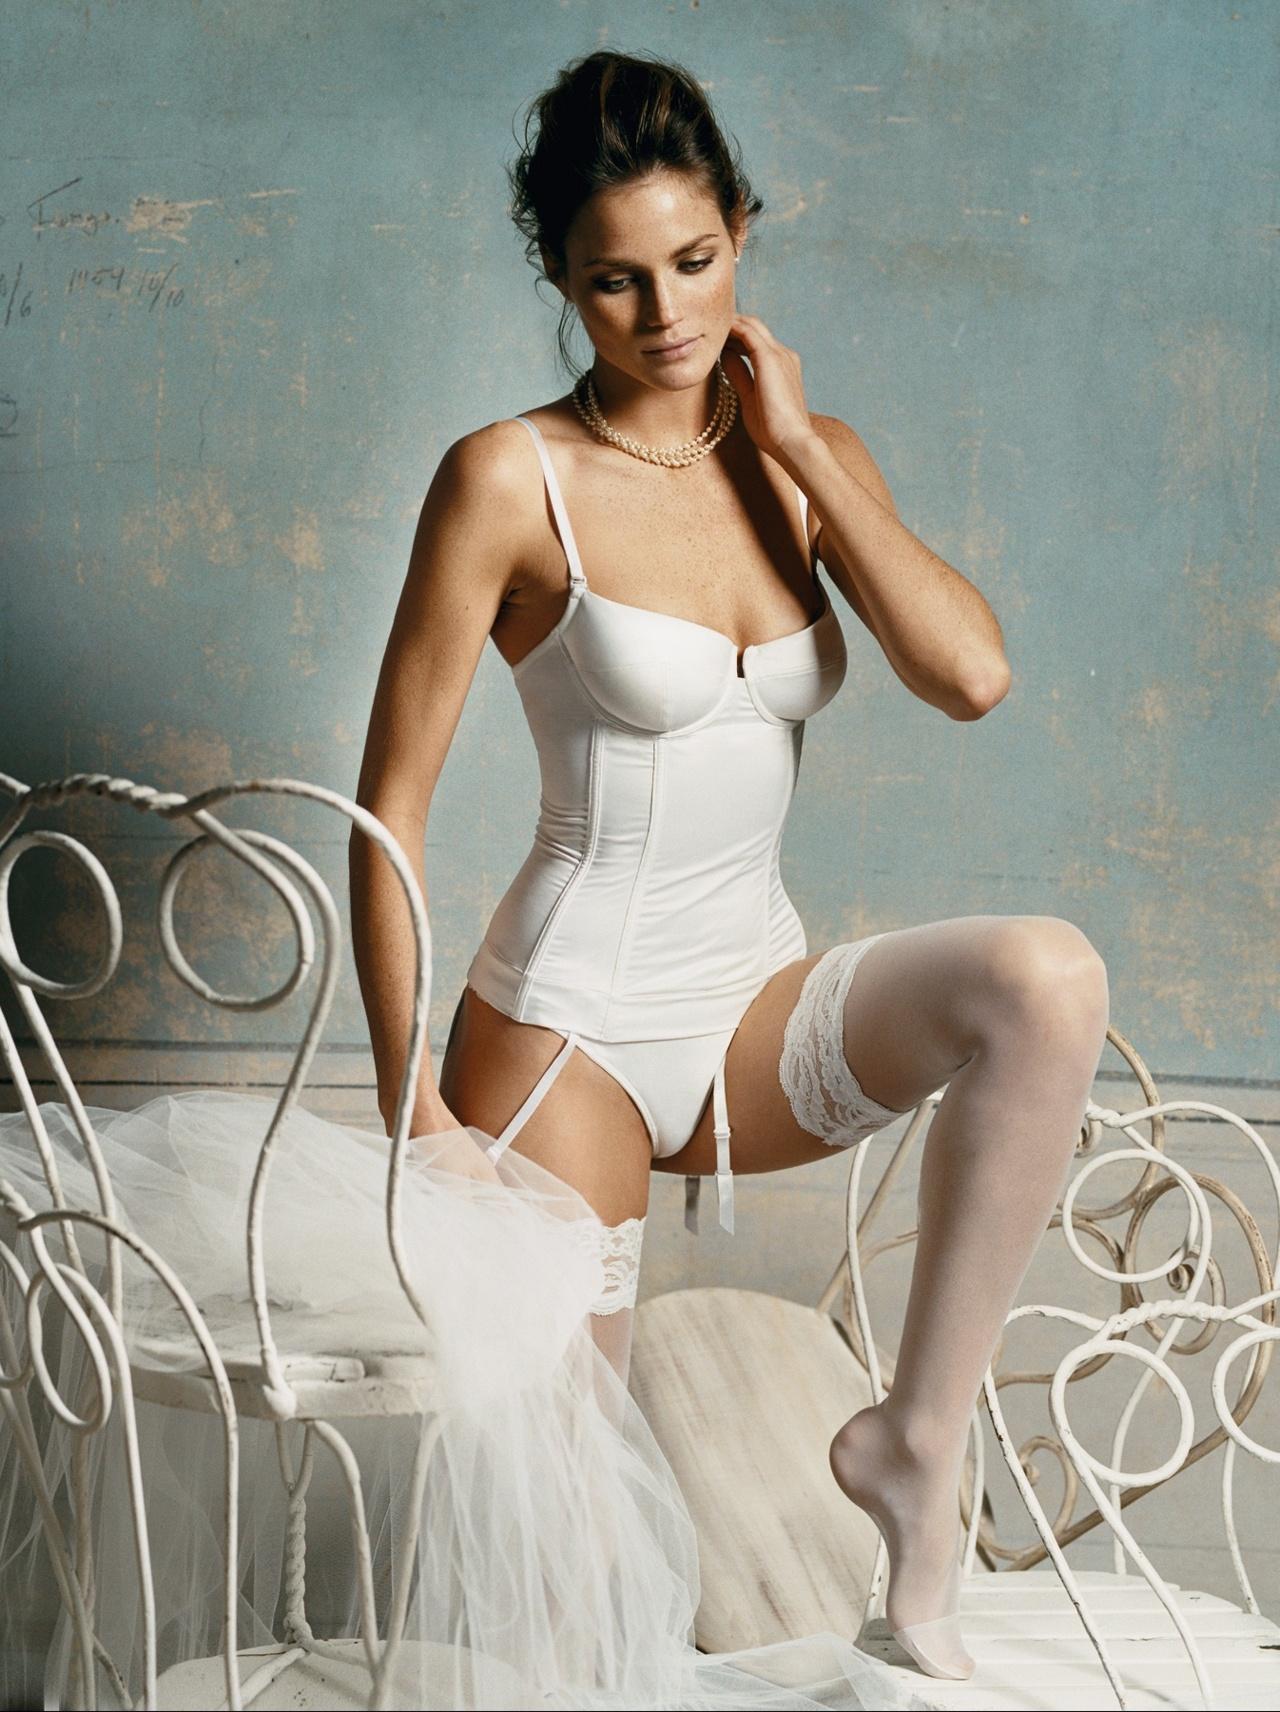 bridal lingerie wedding night